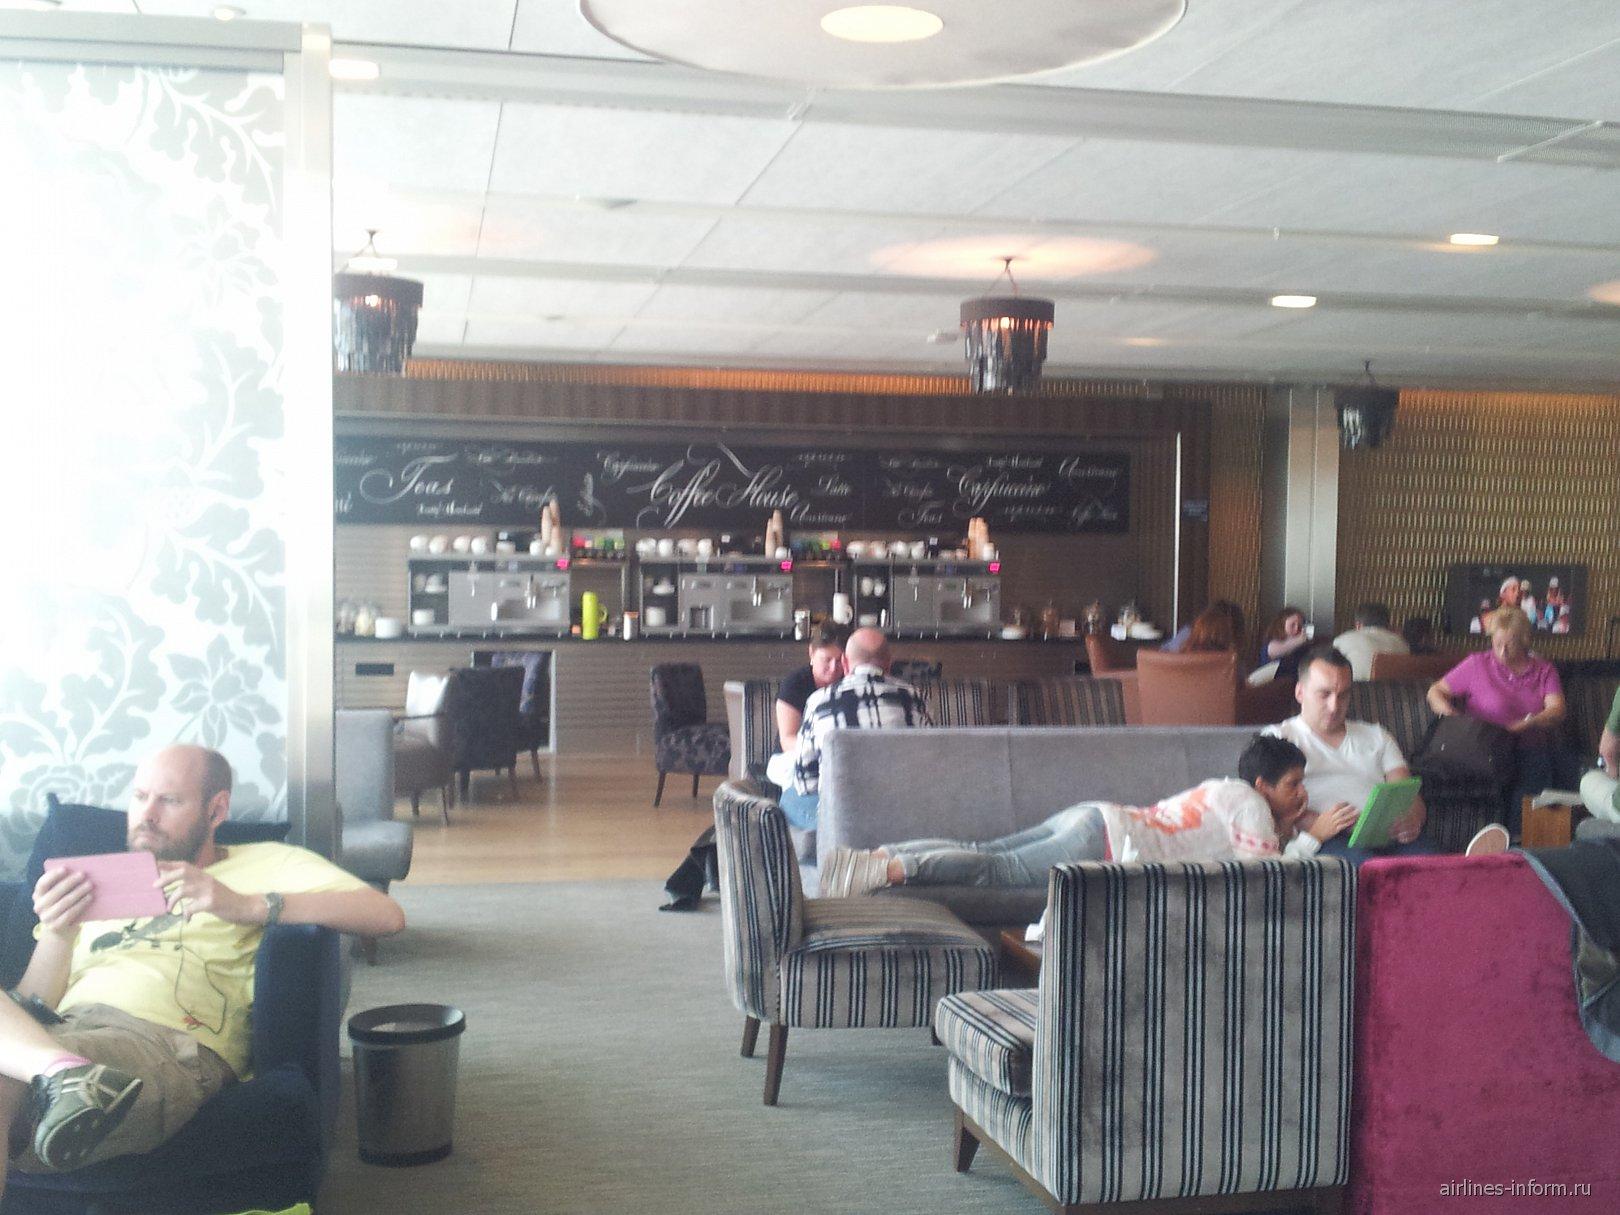 Терминал аэропорта Хитроу